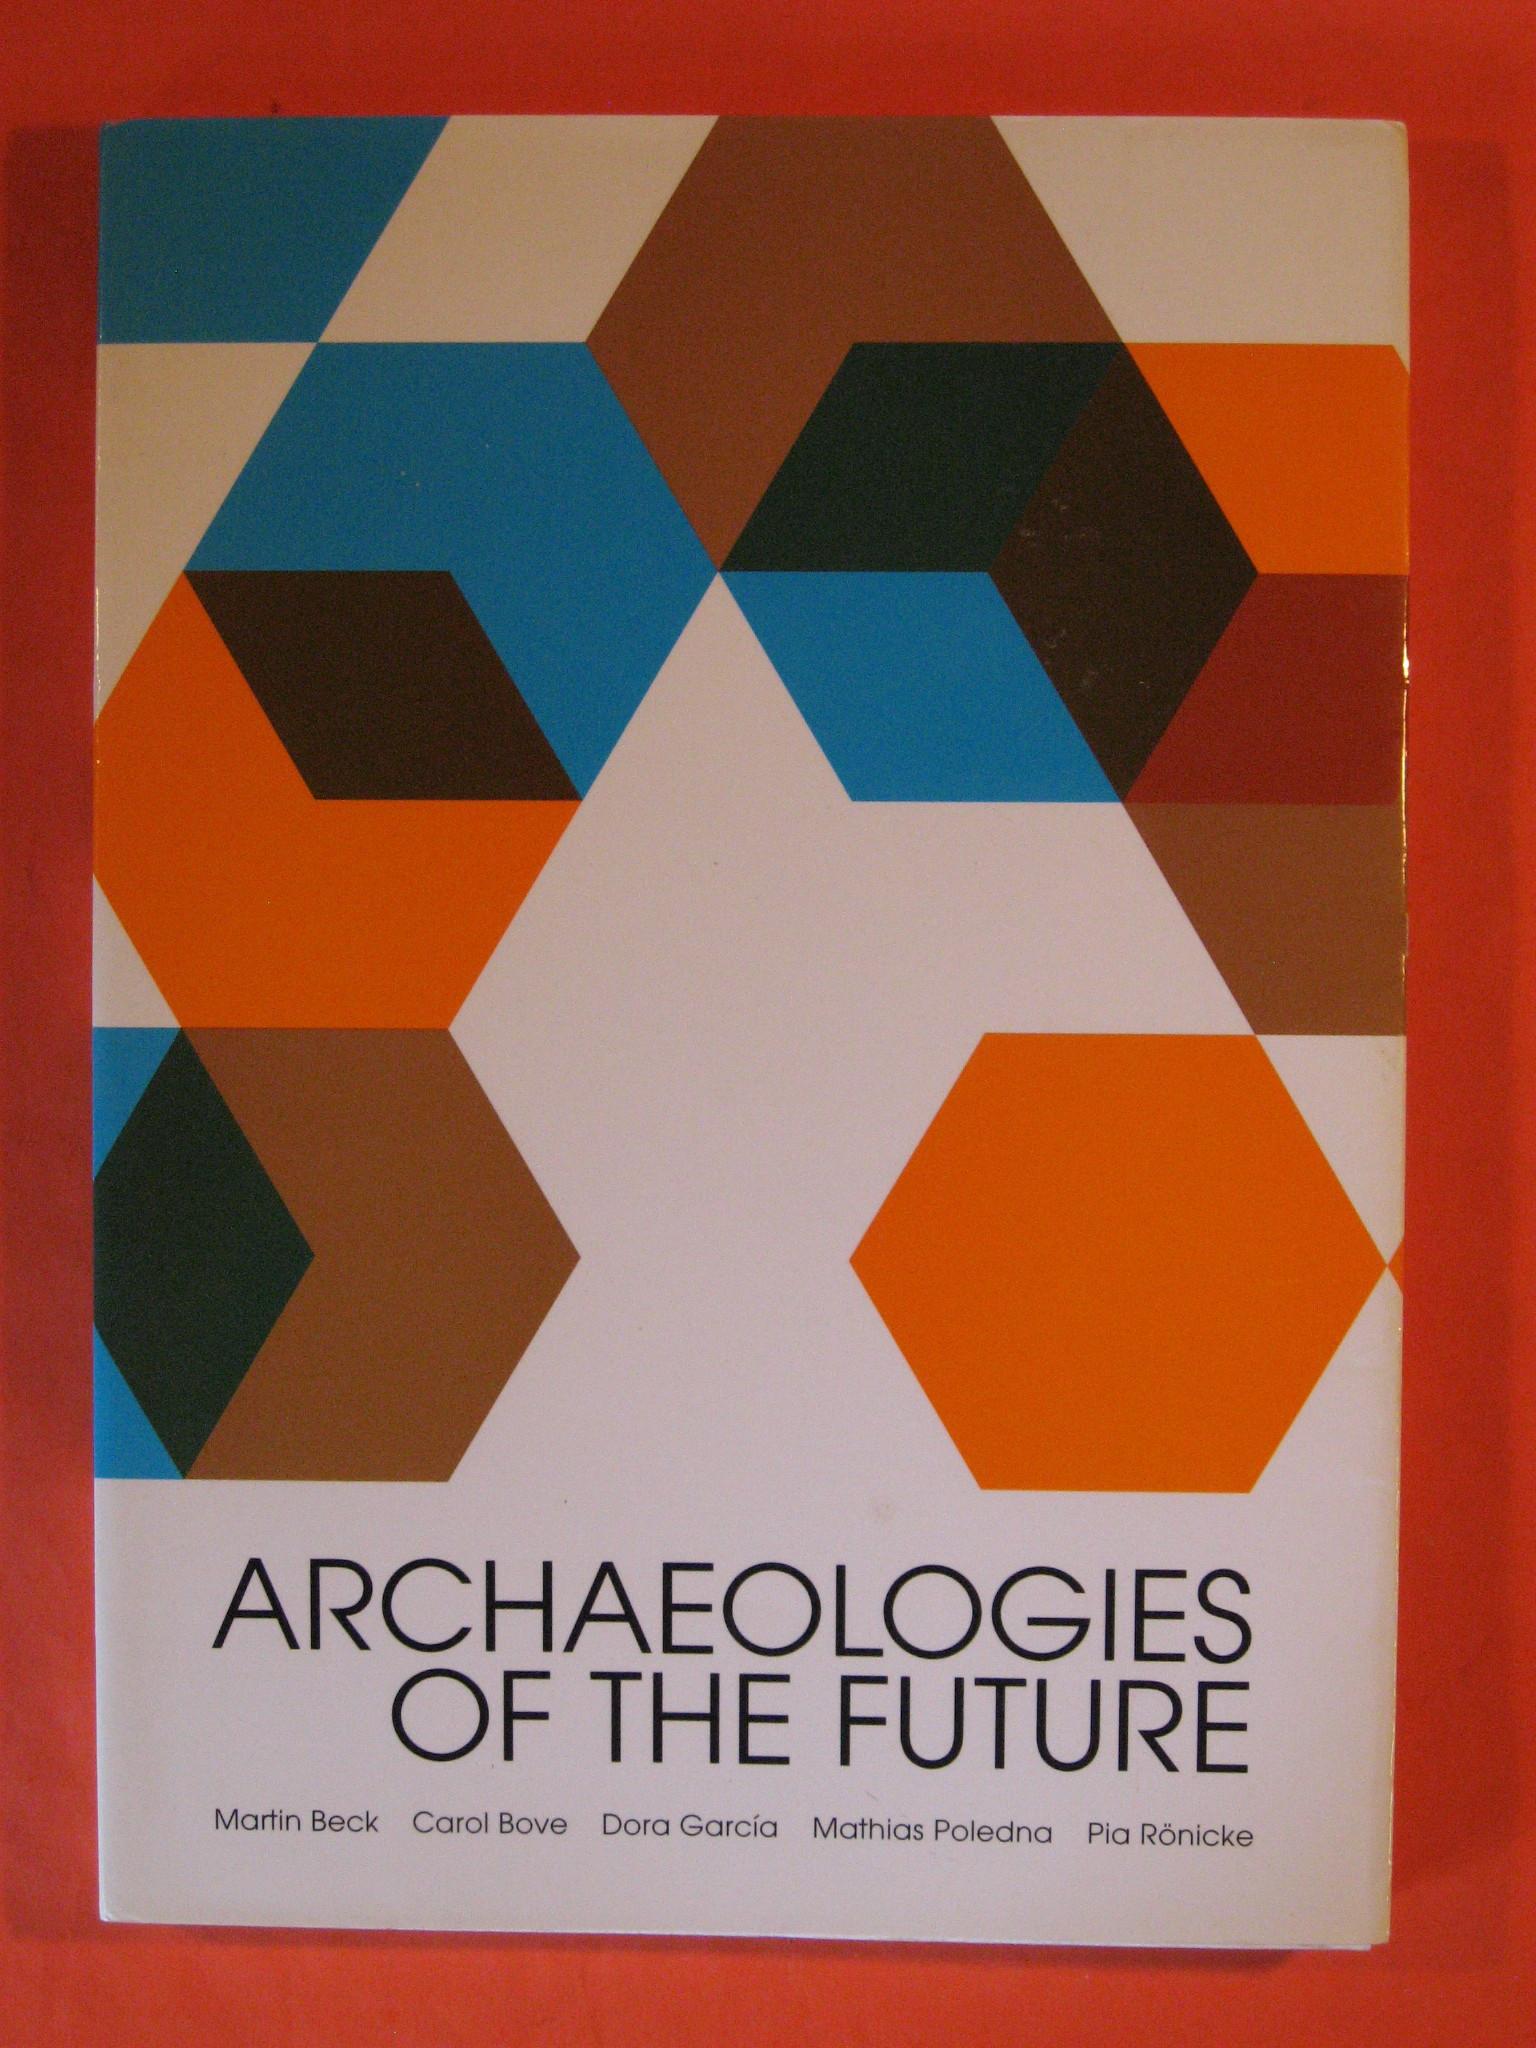 Archaeologies of the Future / Etorkizuneko Arkeologiak / Arqueologias Del Futuro : Martin Beck, Carol Bove, Dora Garcia, Mathias Poledna, Pia Ronicke, Aguirre, Pelo